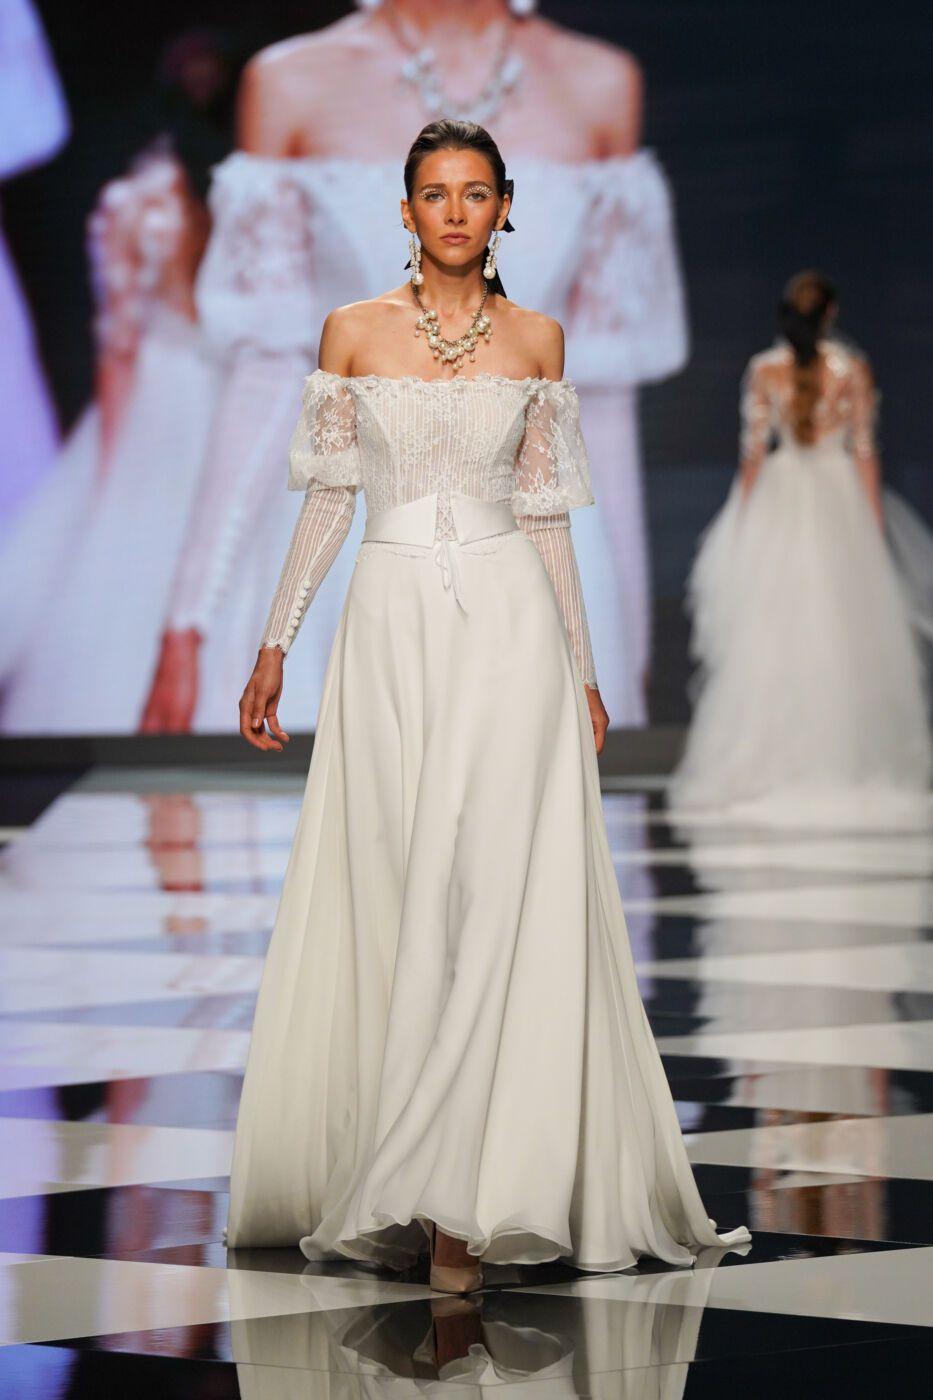 https://www.weddingmagazine.com.ua/wp-content/uploads/2021/08/elisabeta-poligrano-2021-5.jpg